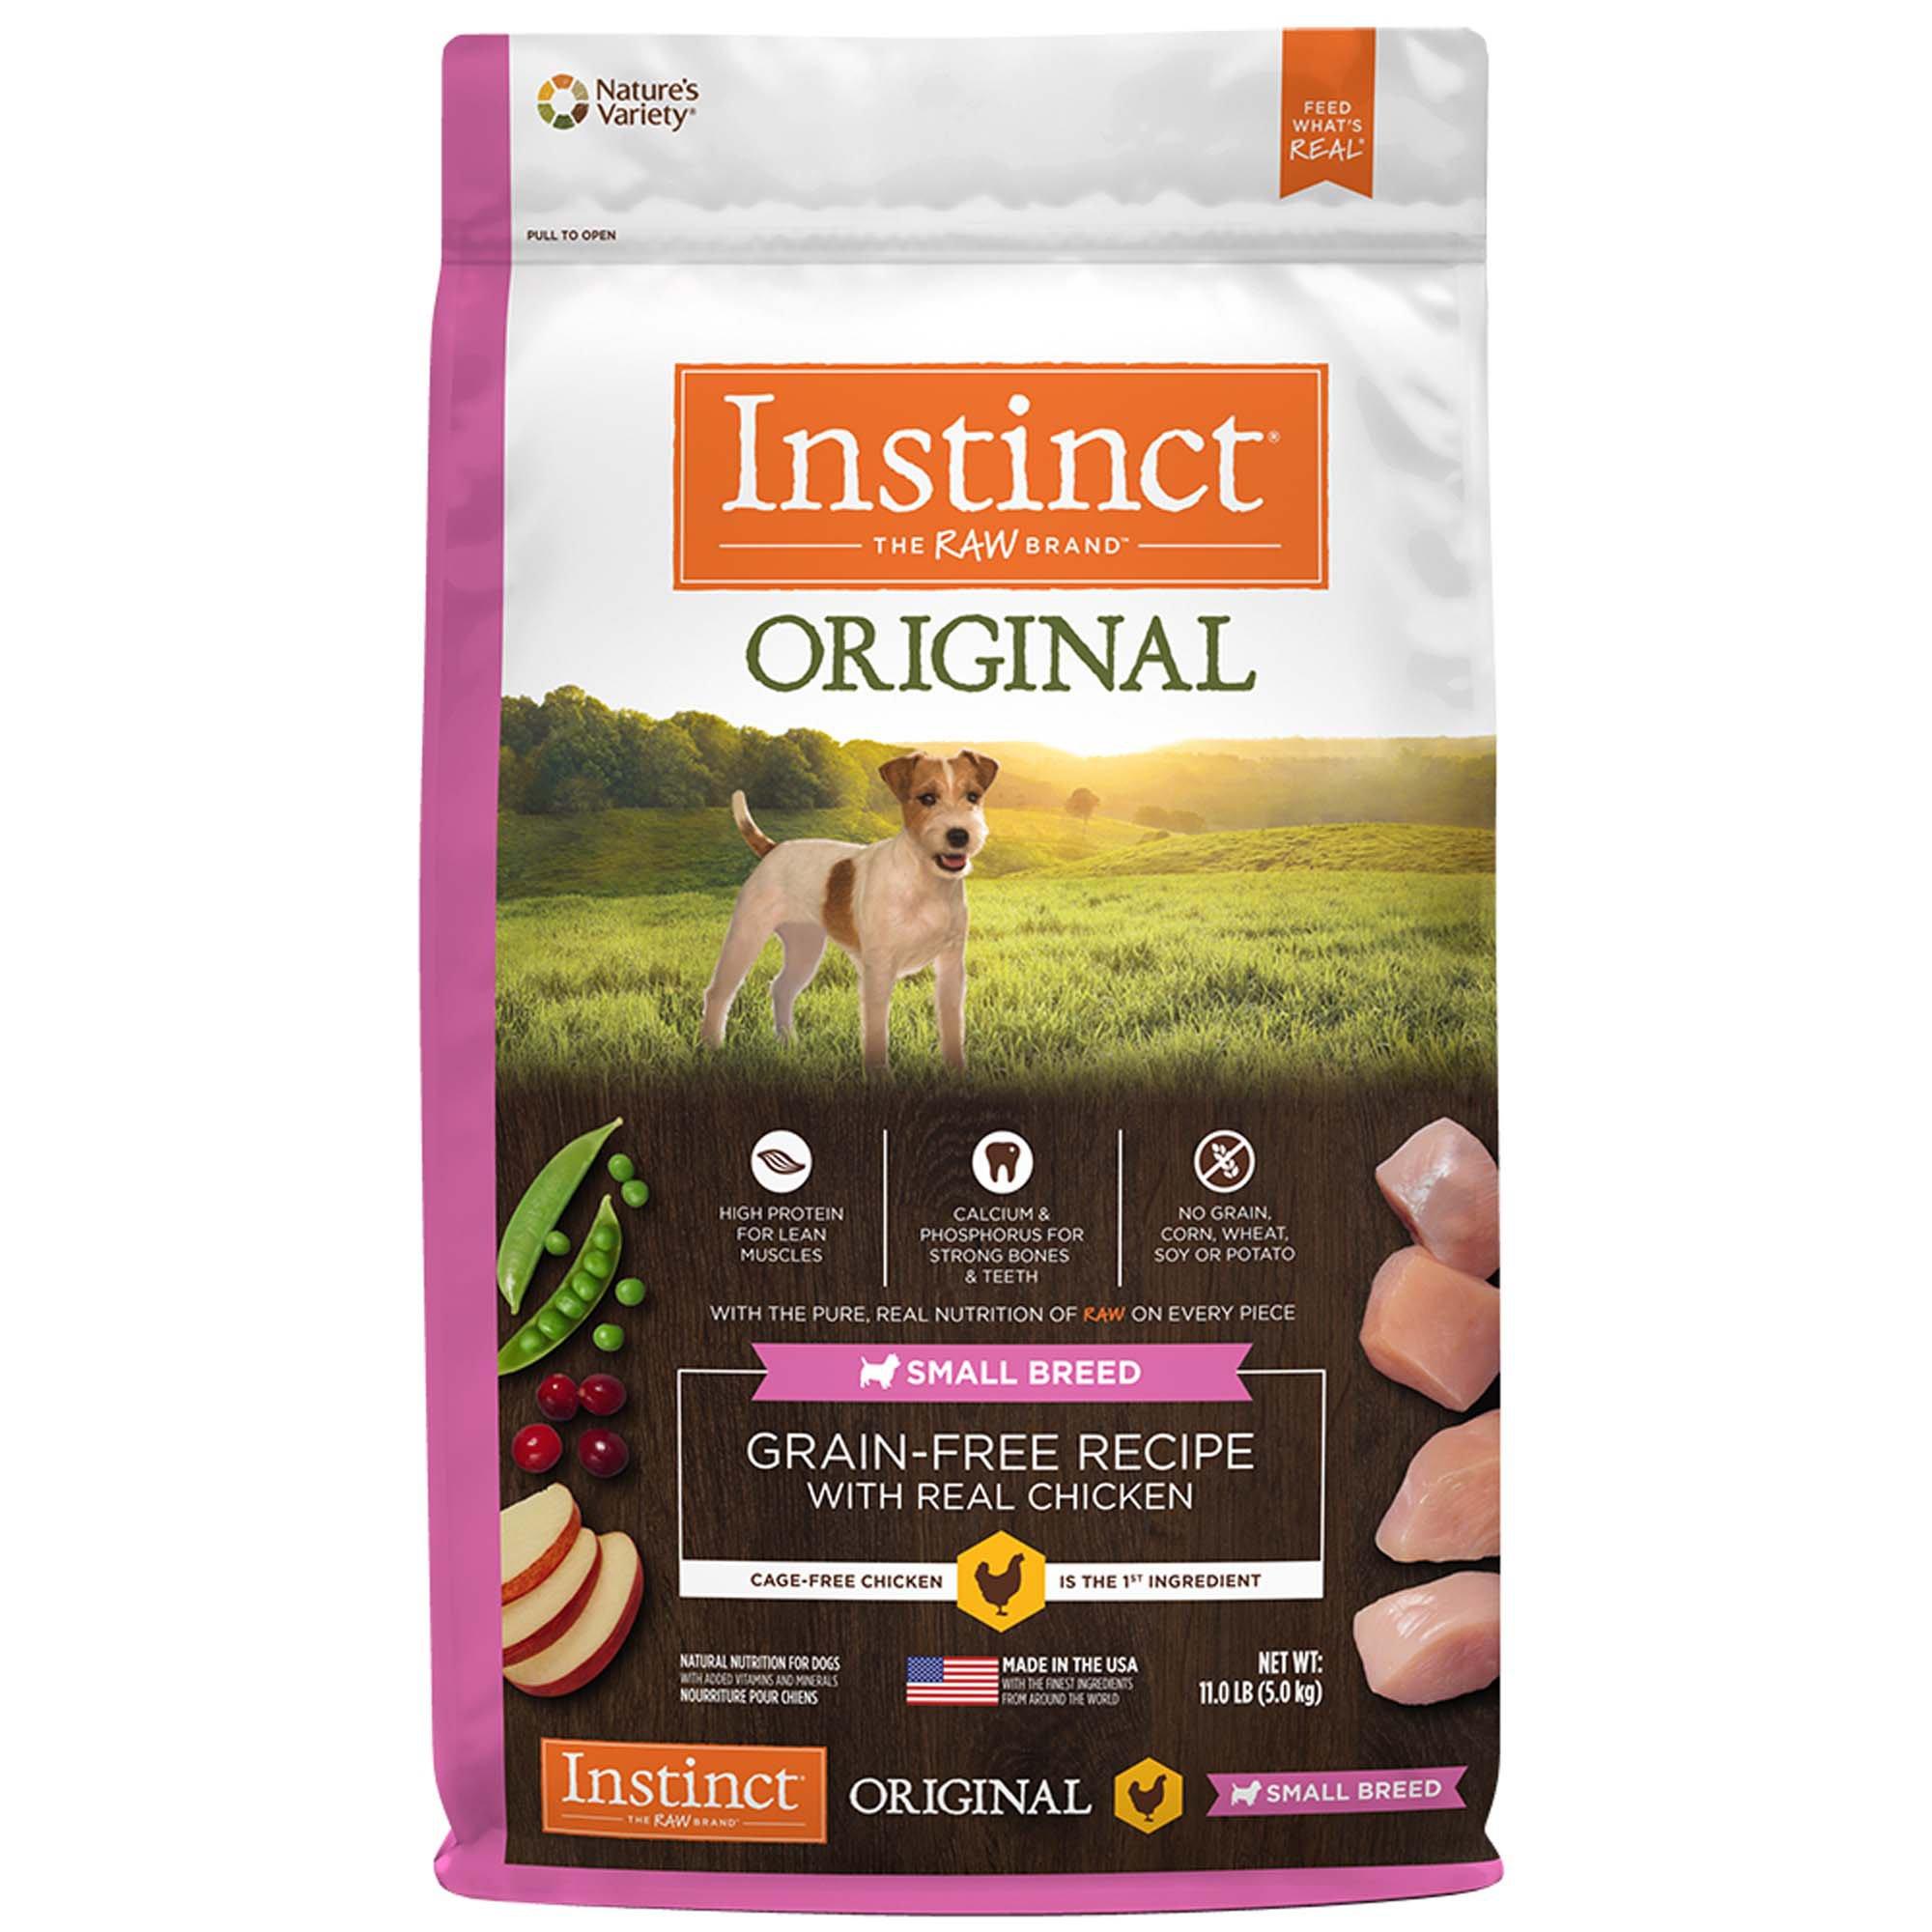 Instinct Original Small Breed Grain Free Recipe With Real Chicken